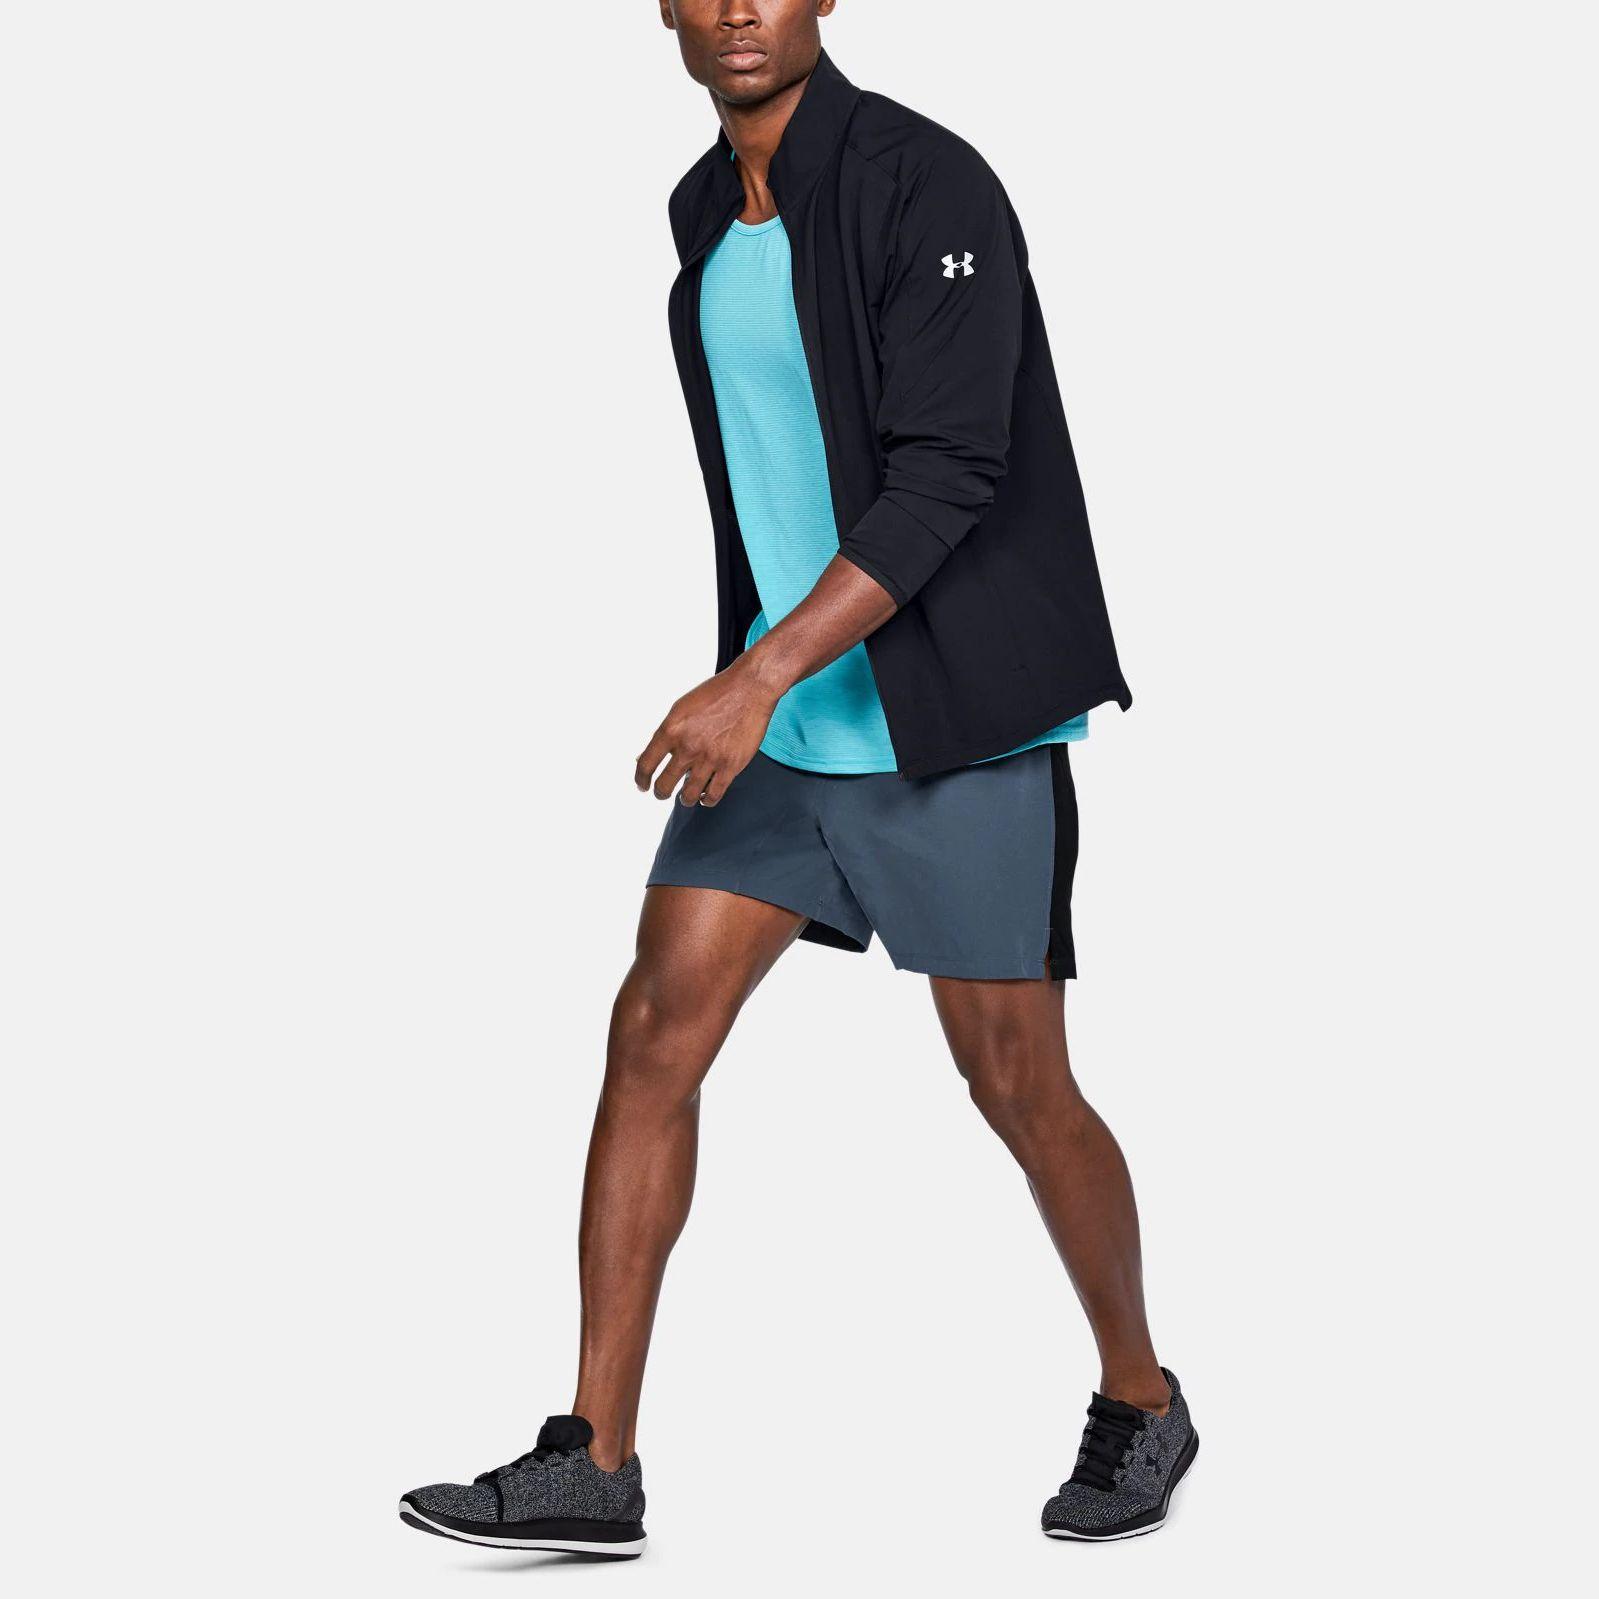 Escultor analogía Sabio  Jackets & Vests | Clothing | Under armour UA Storm Launch Jacket 5199 |  Fitness